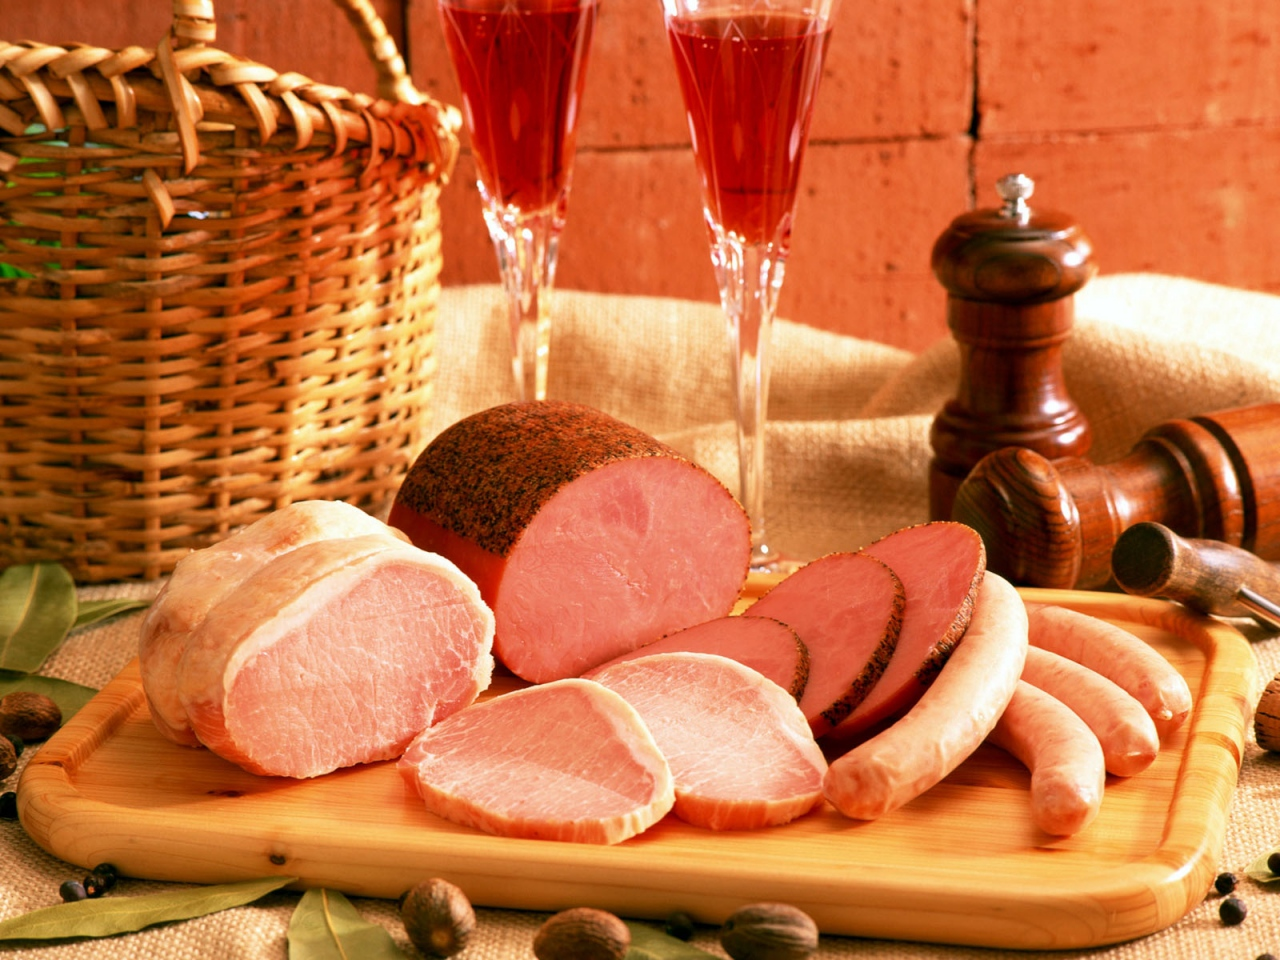 meat_sliced_tasty_86945_1280x960